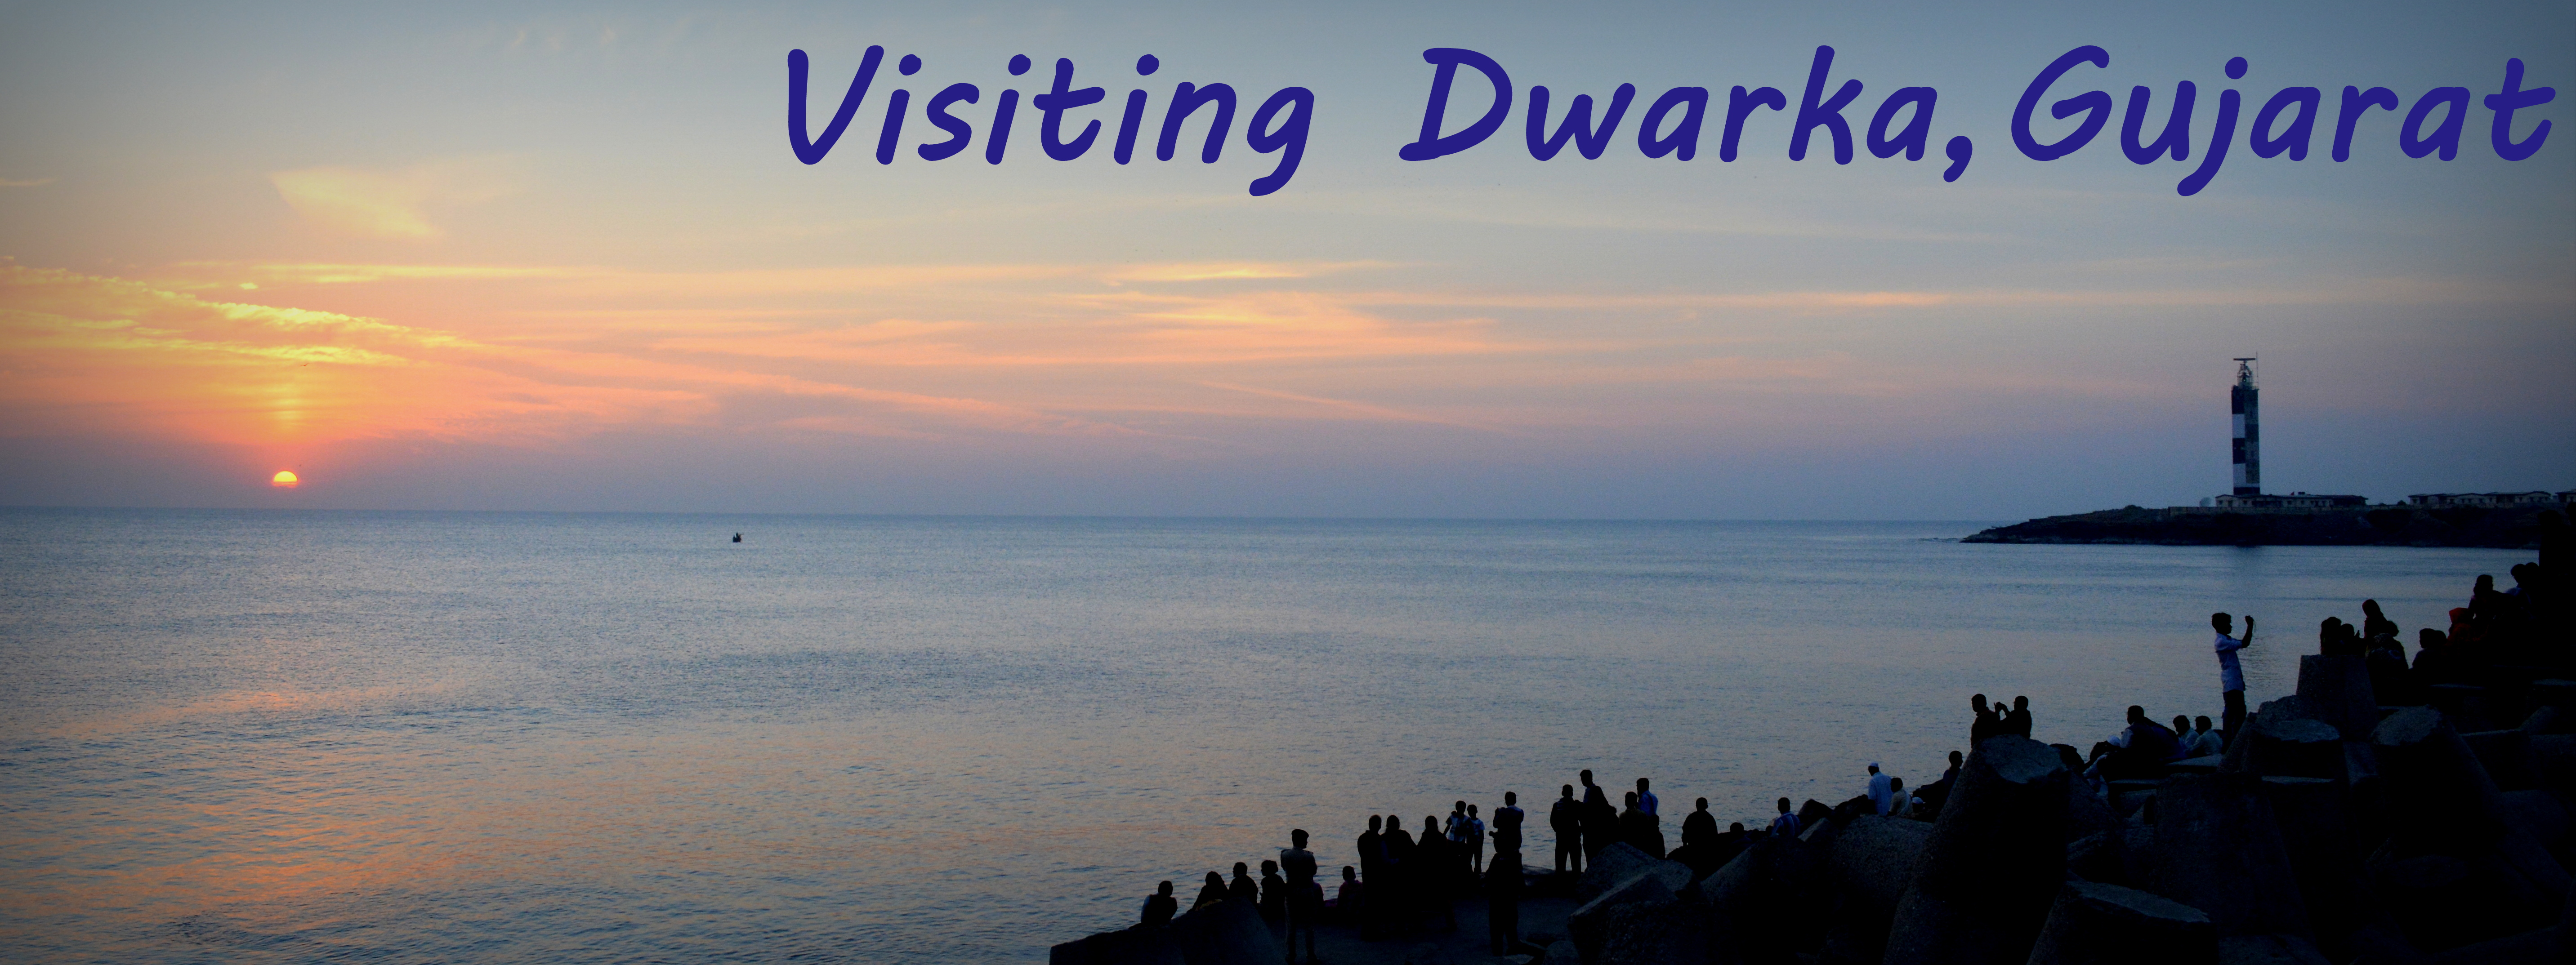 Visiting Dwarka, Gujarat